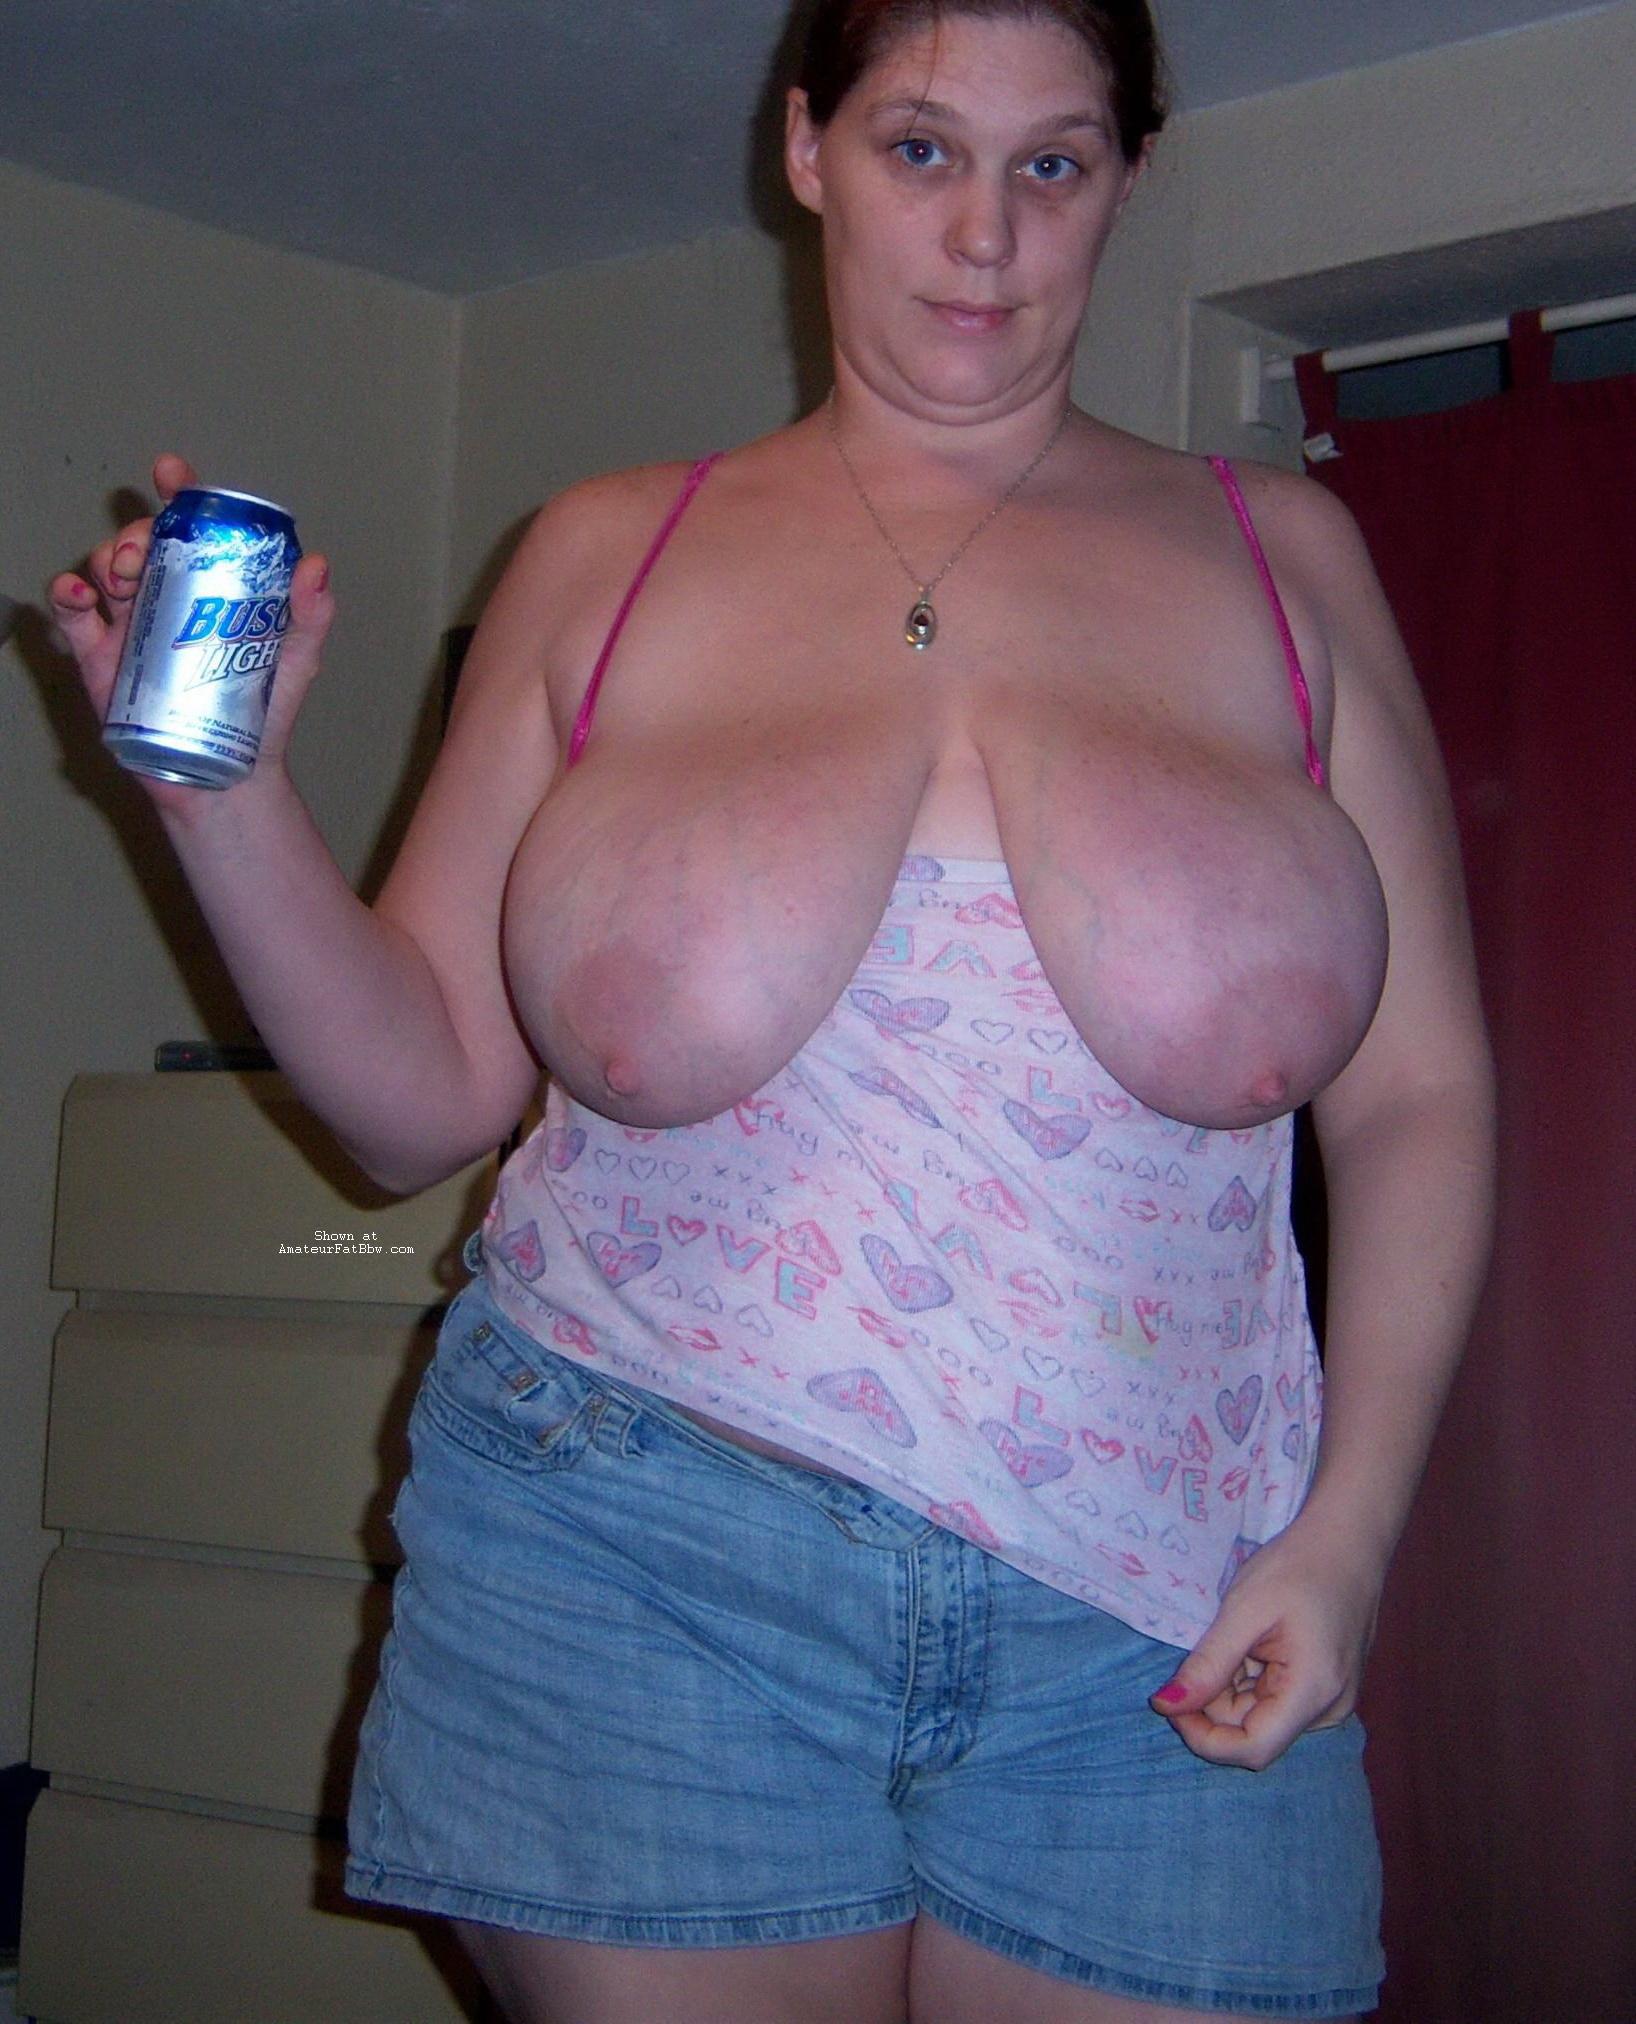 Amateur Wife Sharing bbw amateur wife sharing - hot xxx images, free porn photos